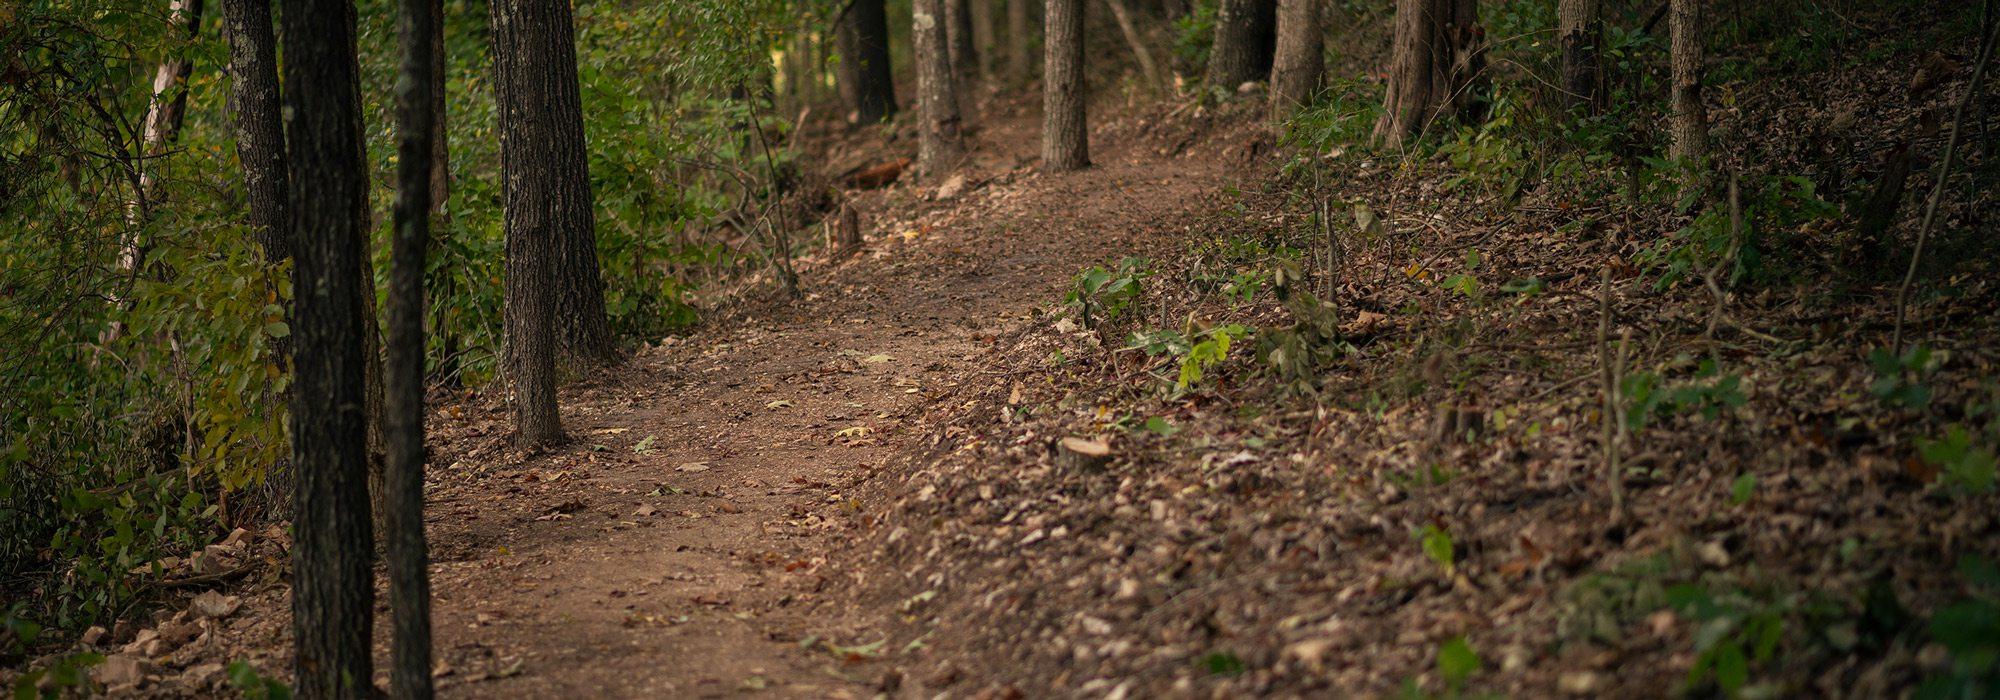 Trail photp